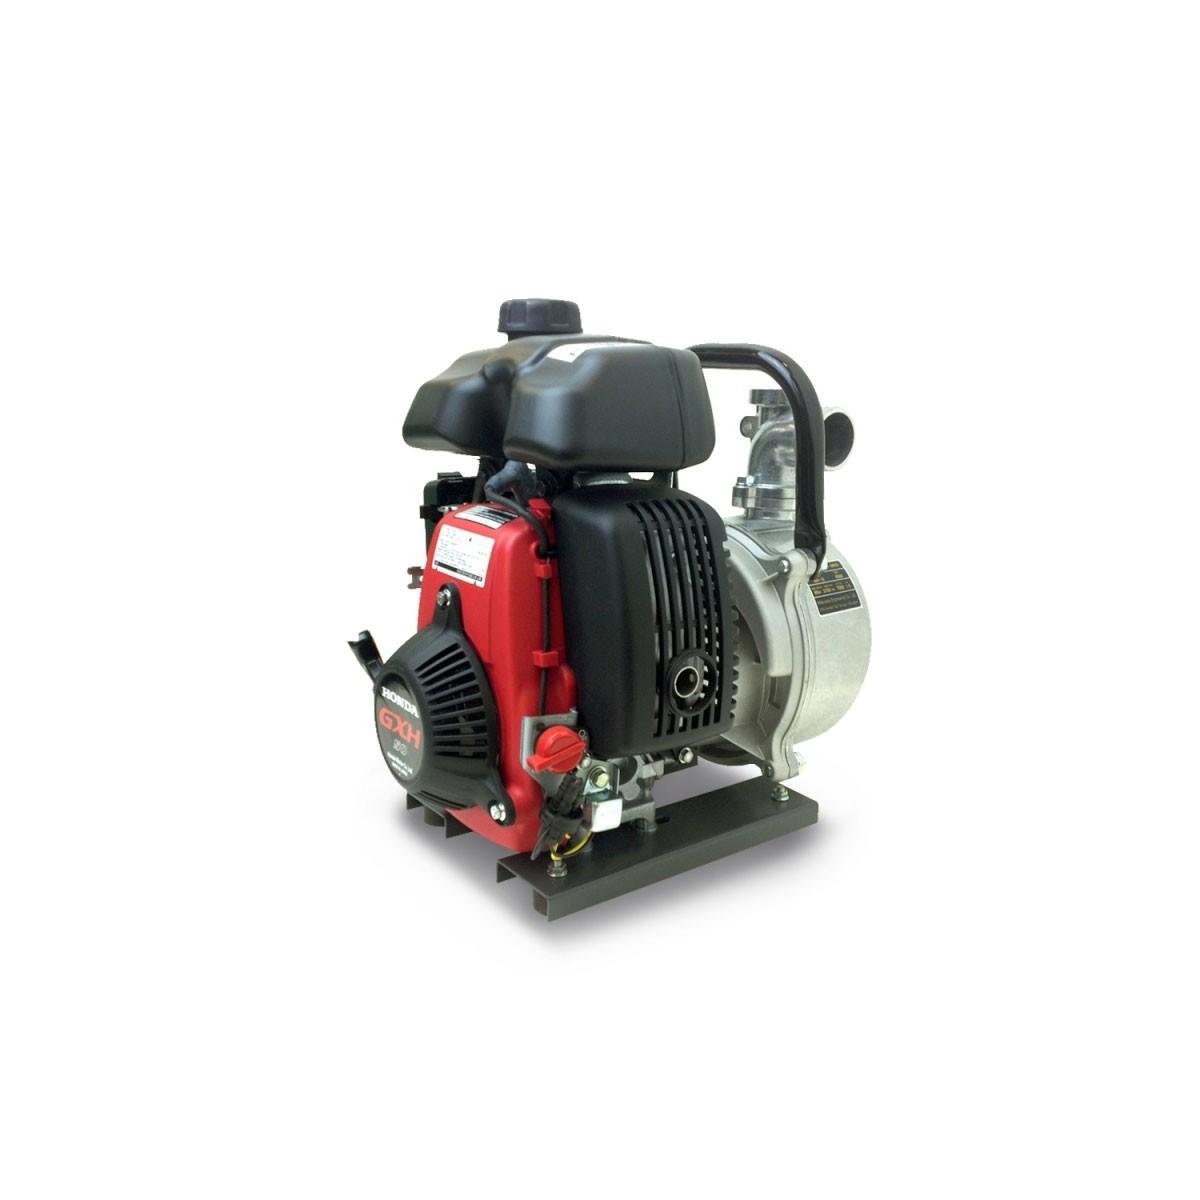 Honda motobomba presion wh10x (12